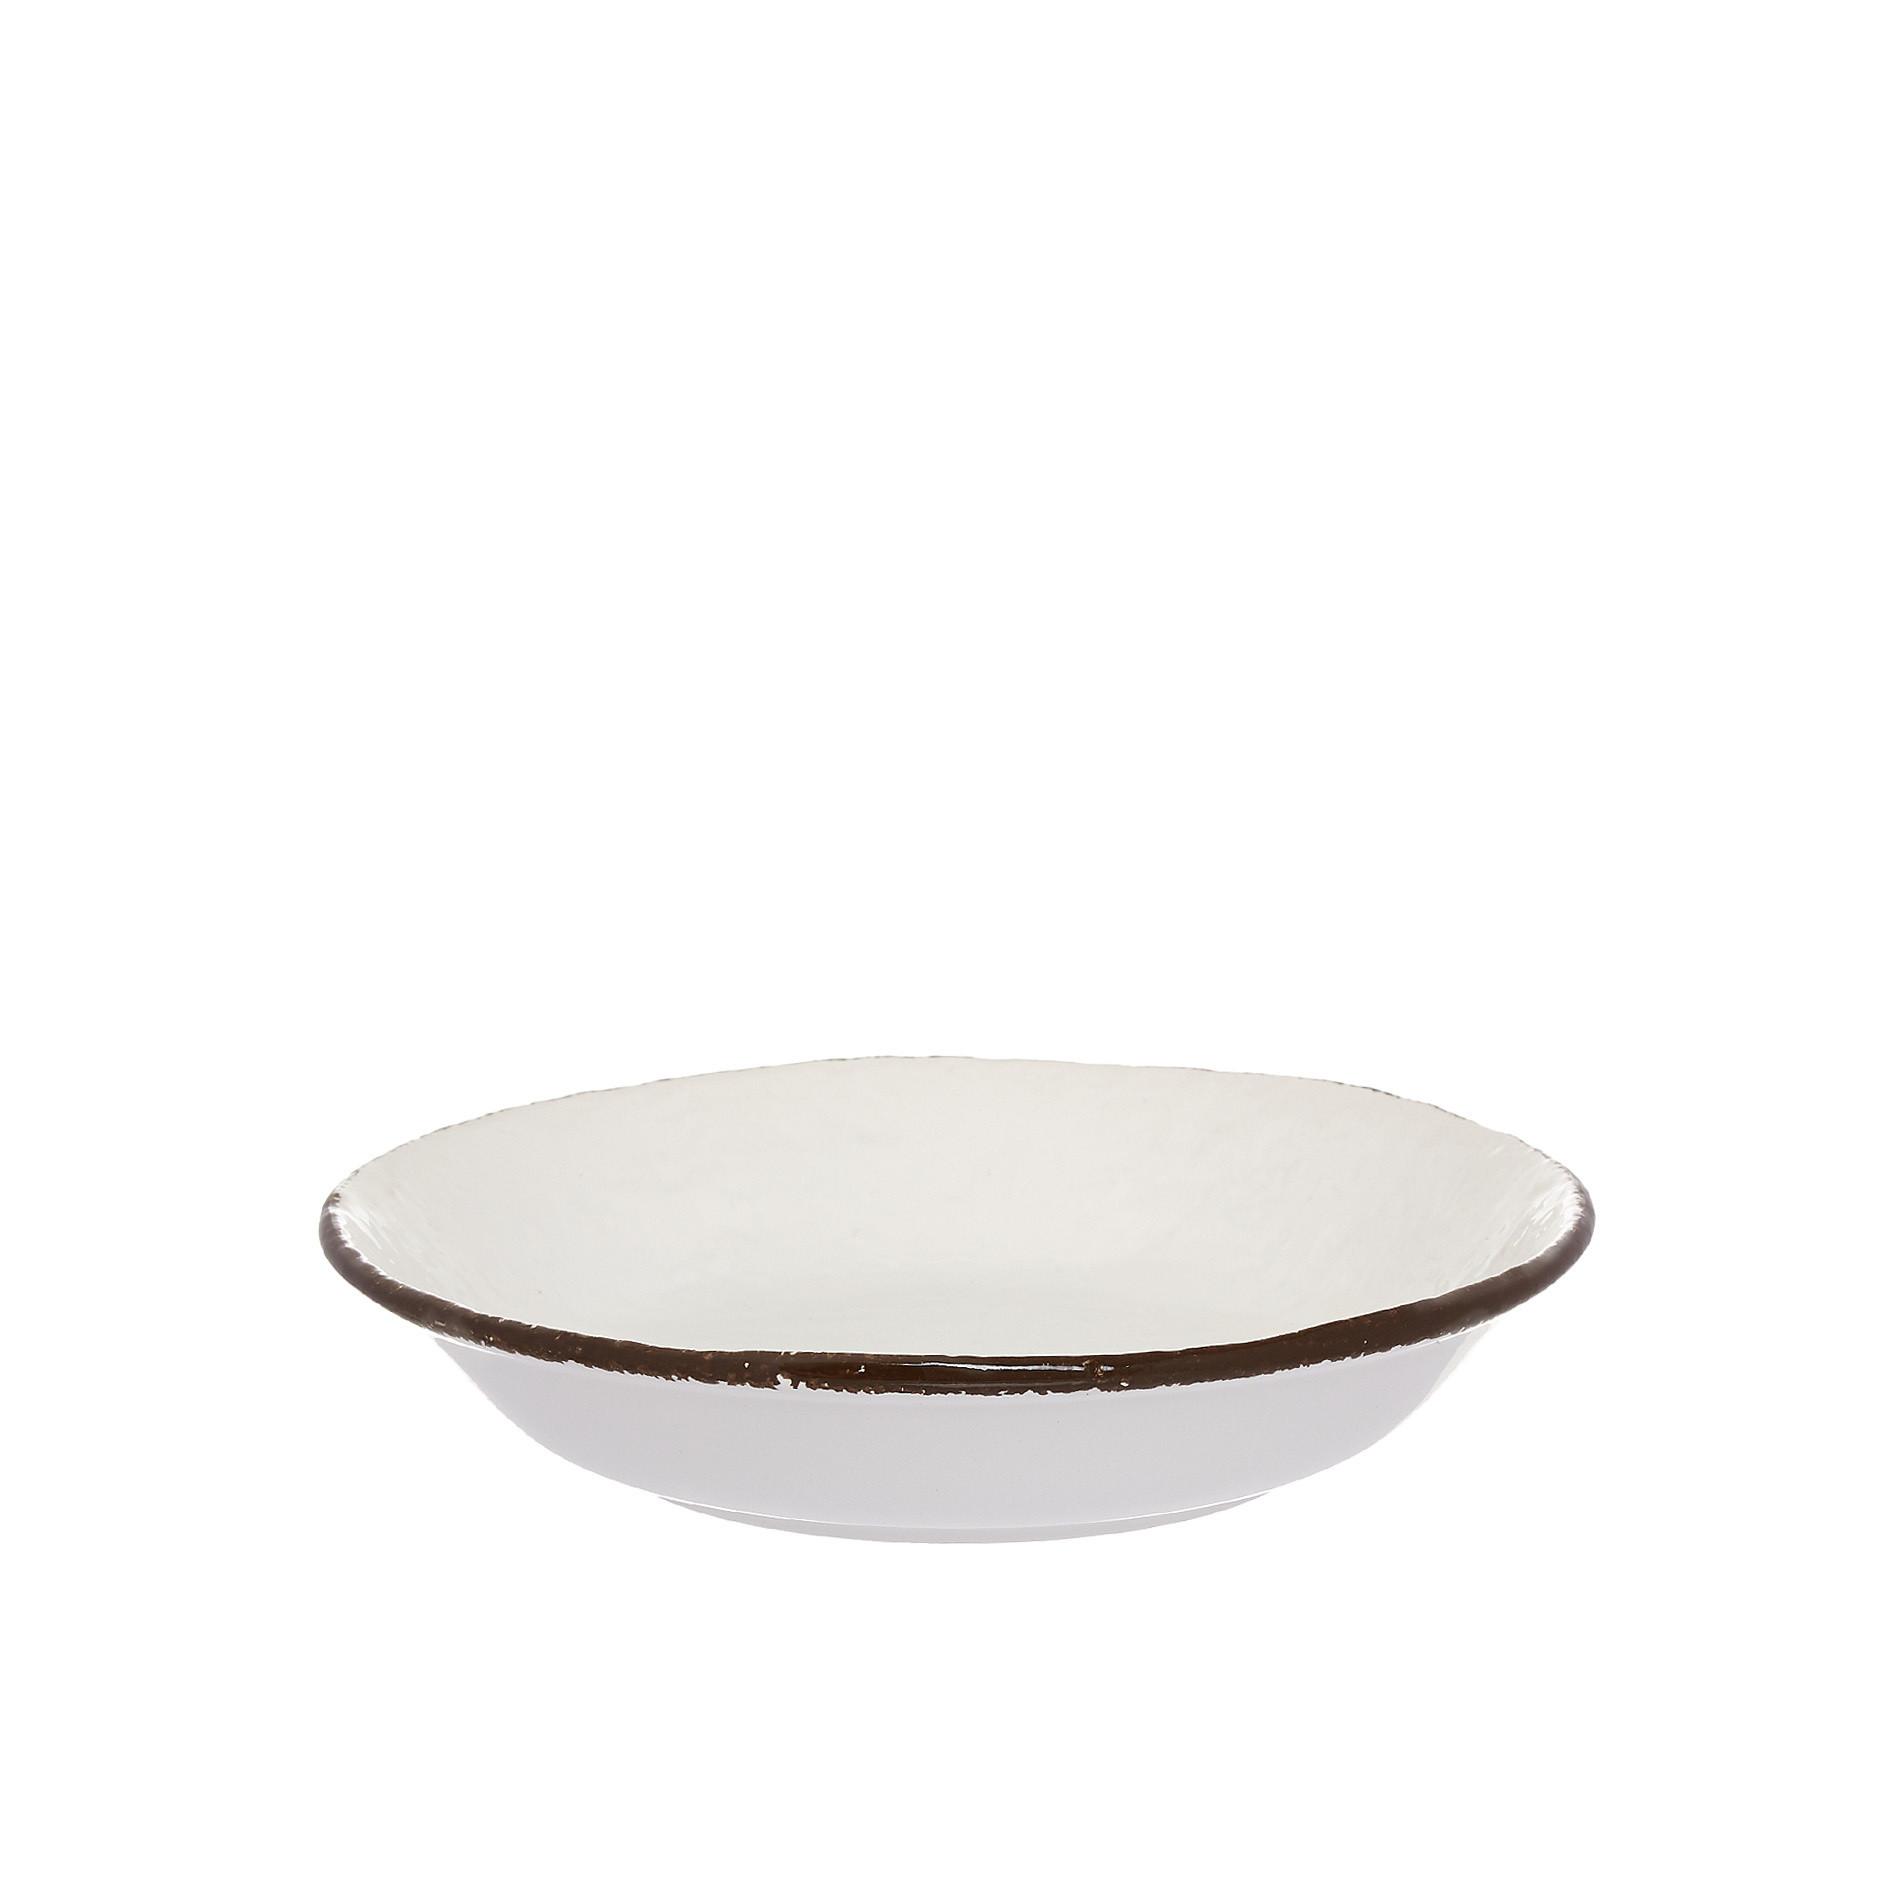 Piatto fondo ceramica artigianale Preta, Bianco, large image number 0